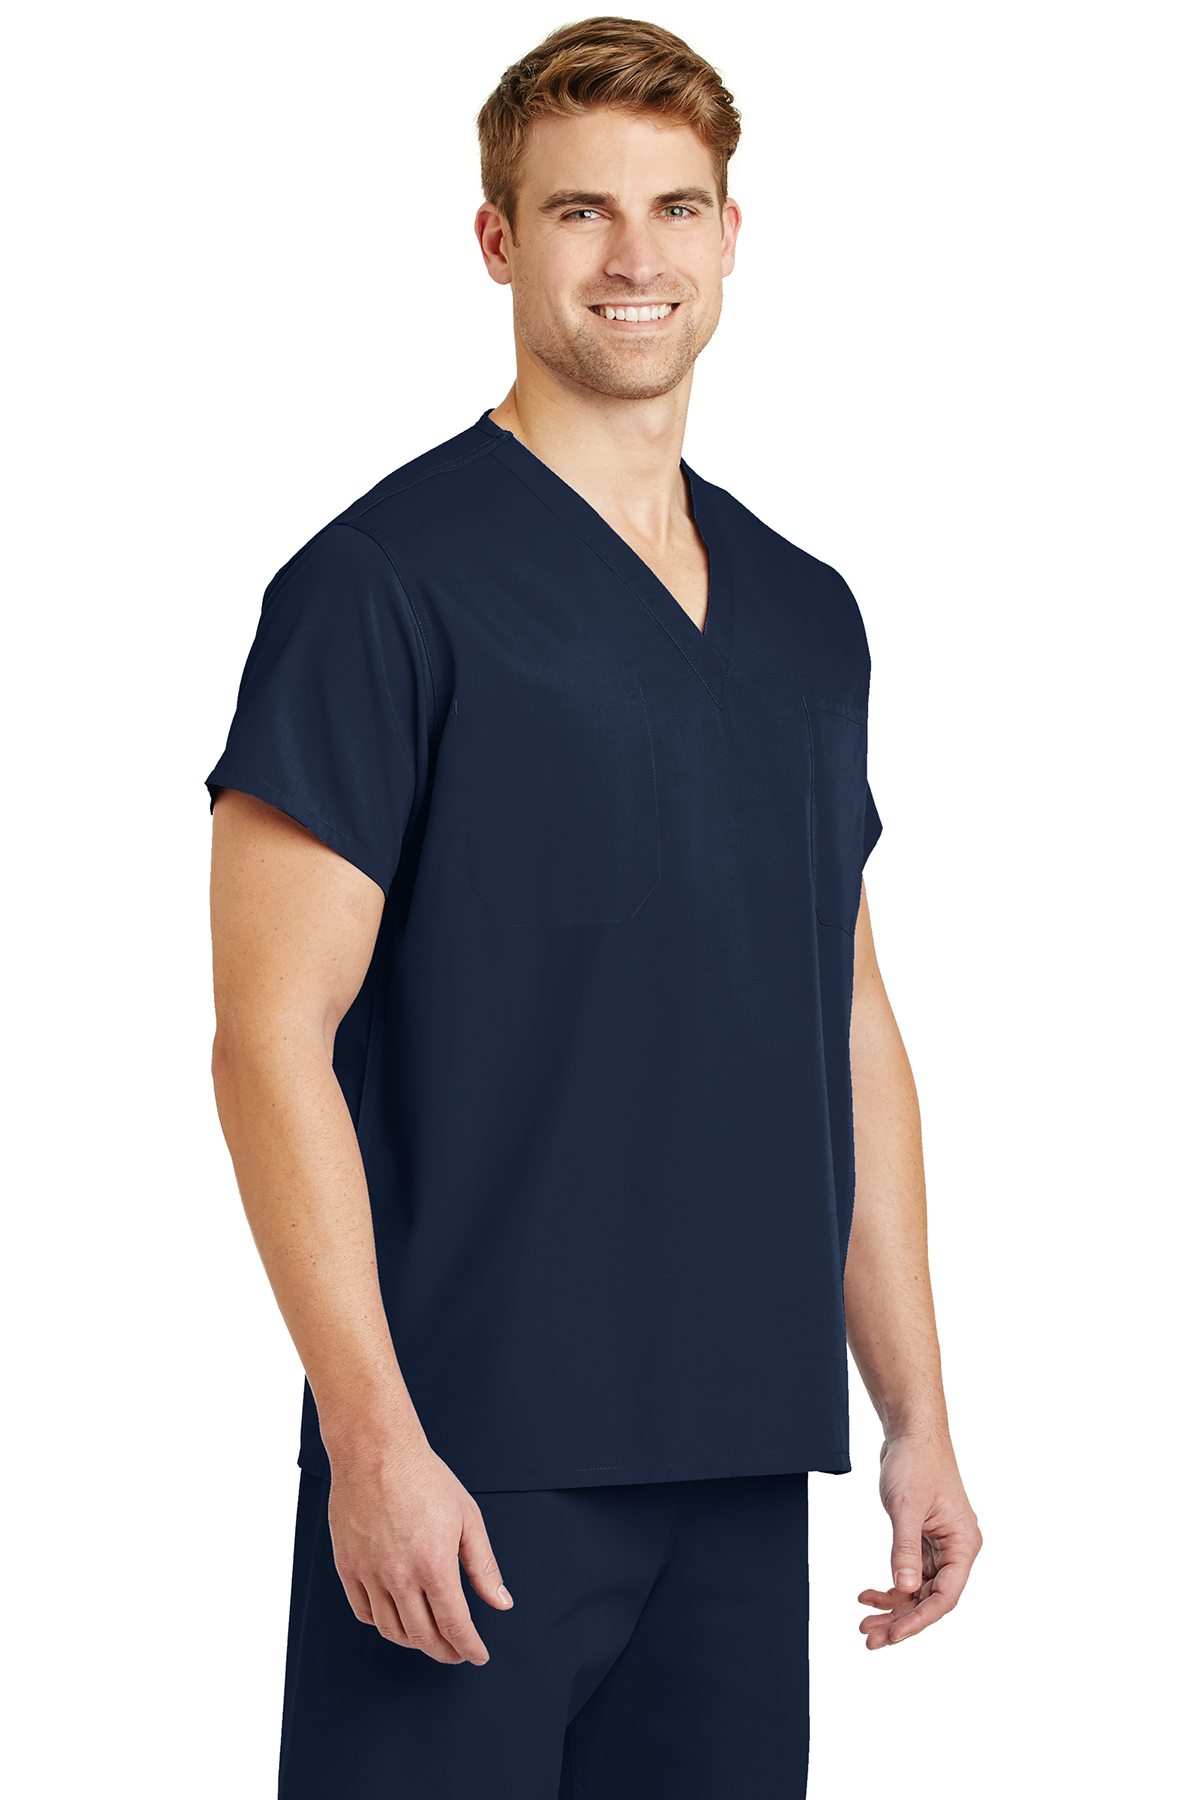 78ebe17c8c6 CornerStone® - Reversible V-Neck Scrub Top | Medical/Scrubs ...